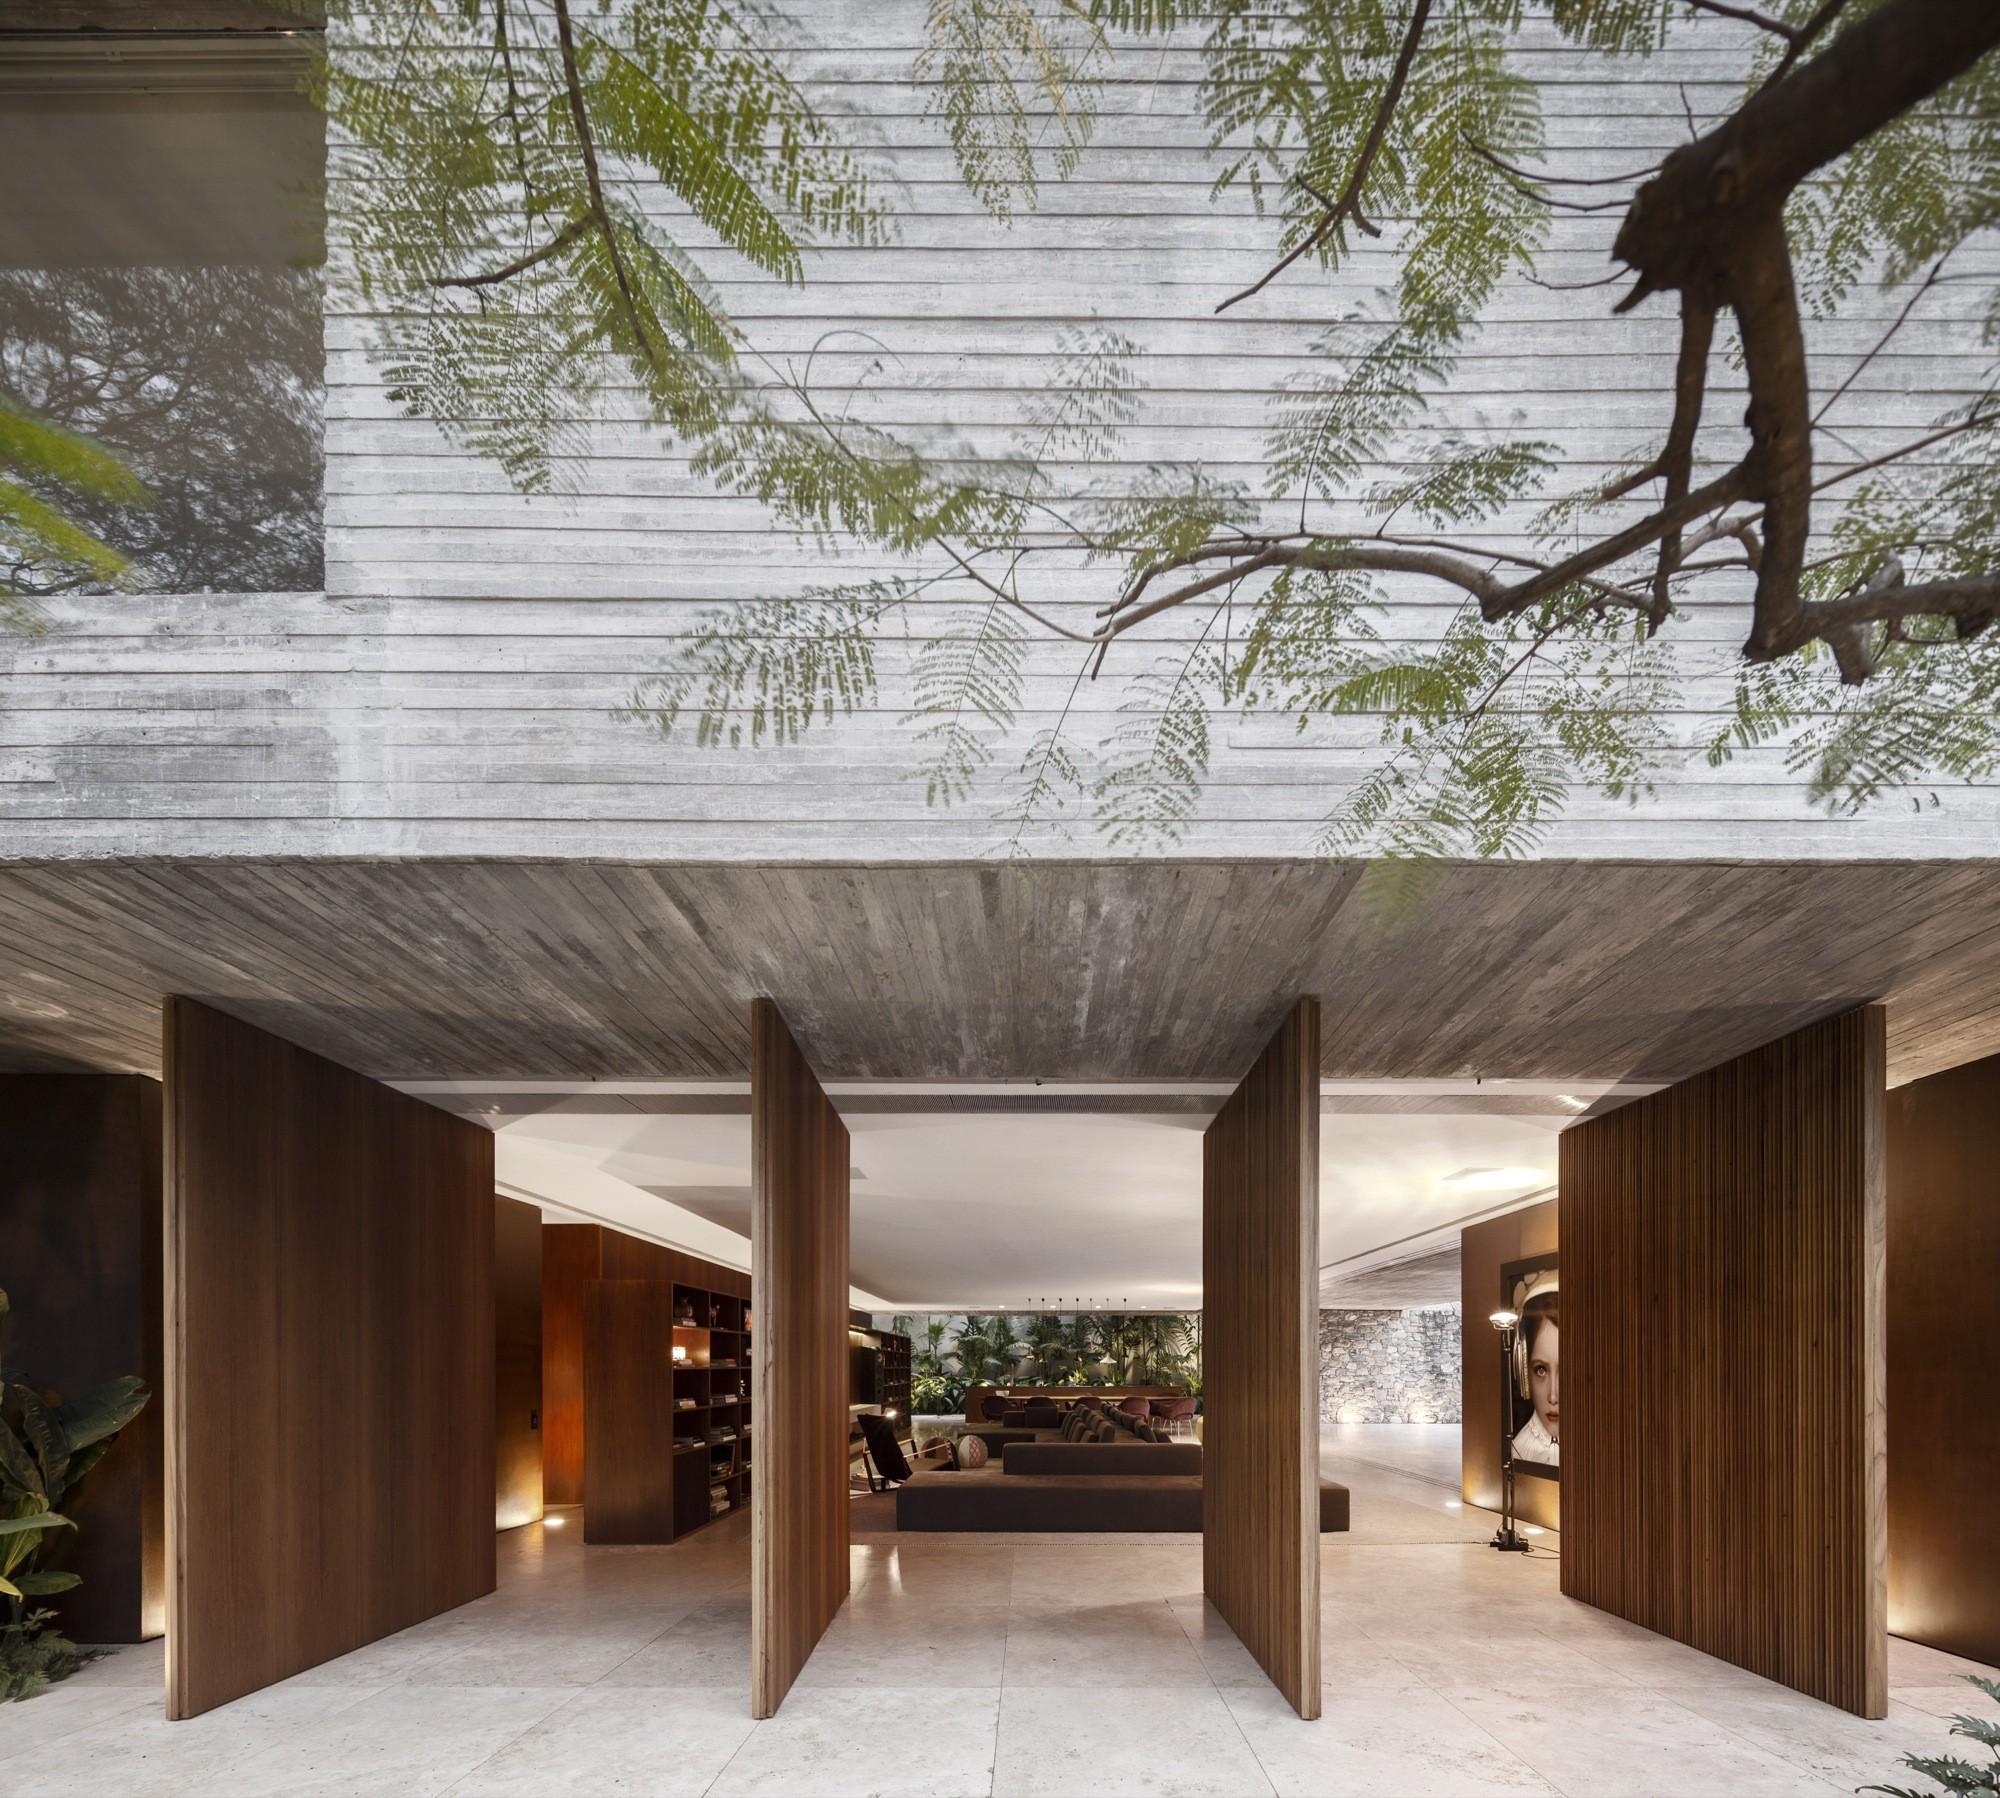 Ipes House / Studio MK27 - Marcio Kogan + Lair Reis, © Fernando Guerra | FG+SG